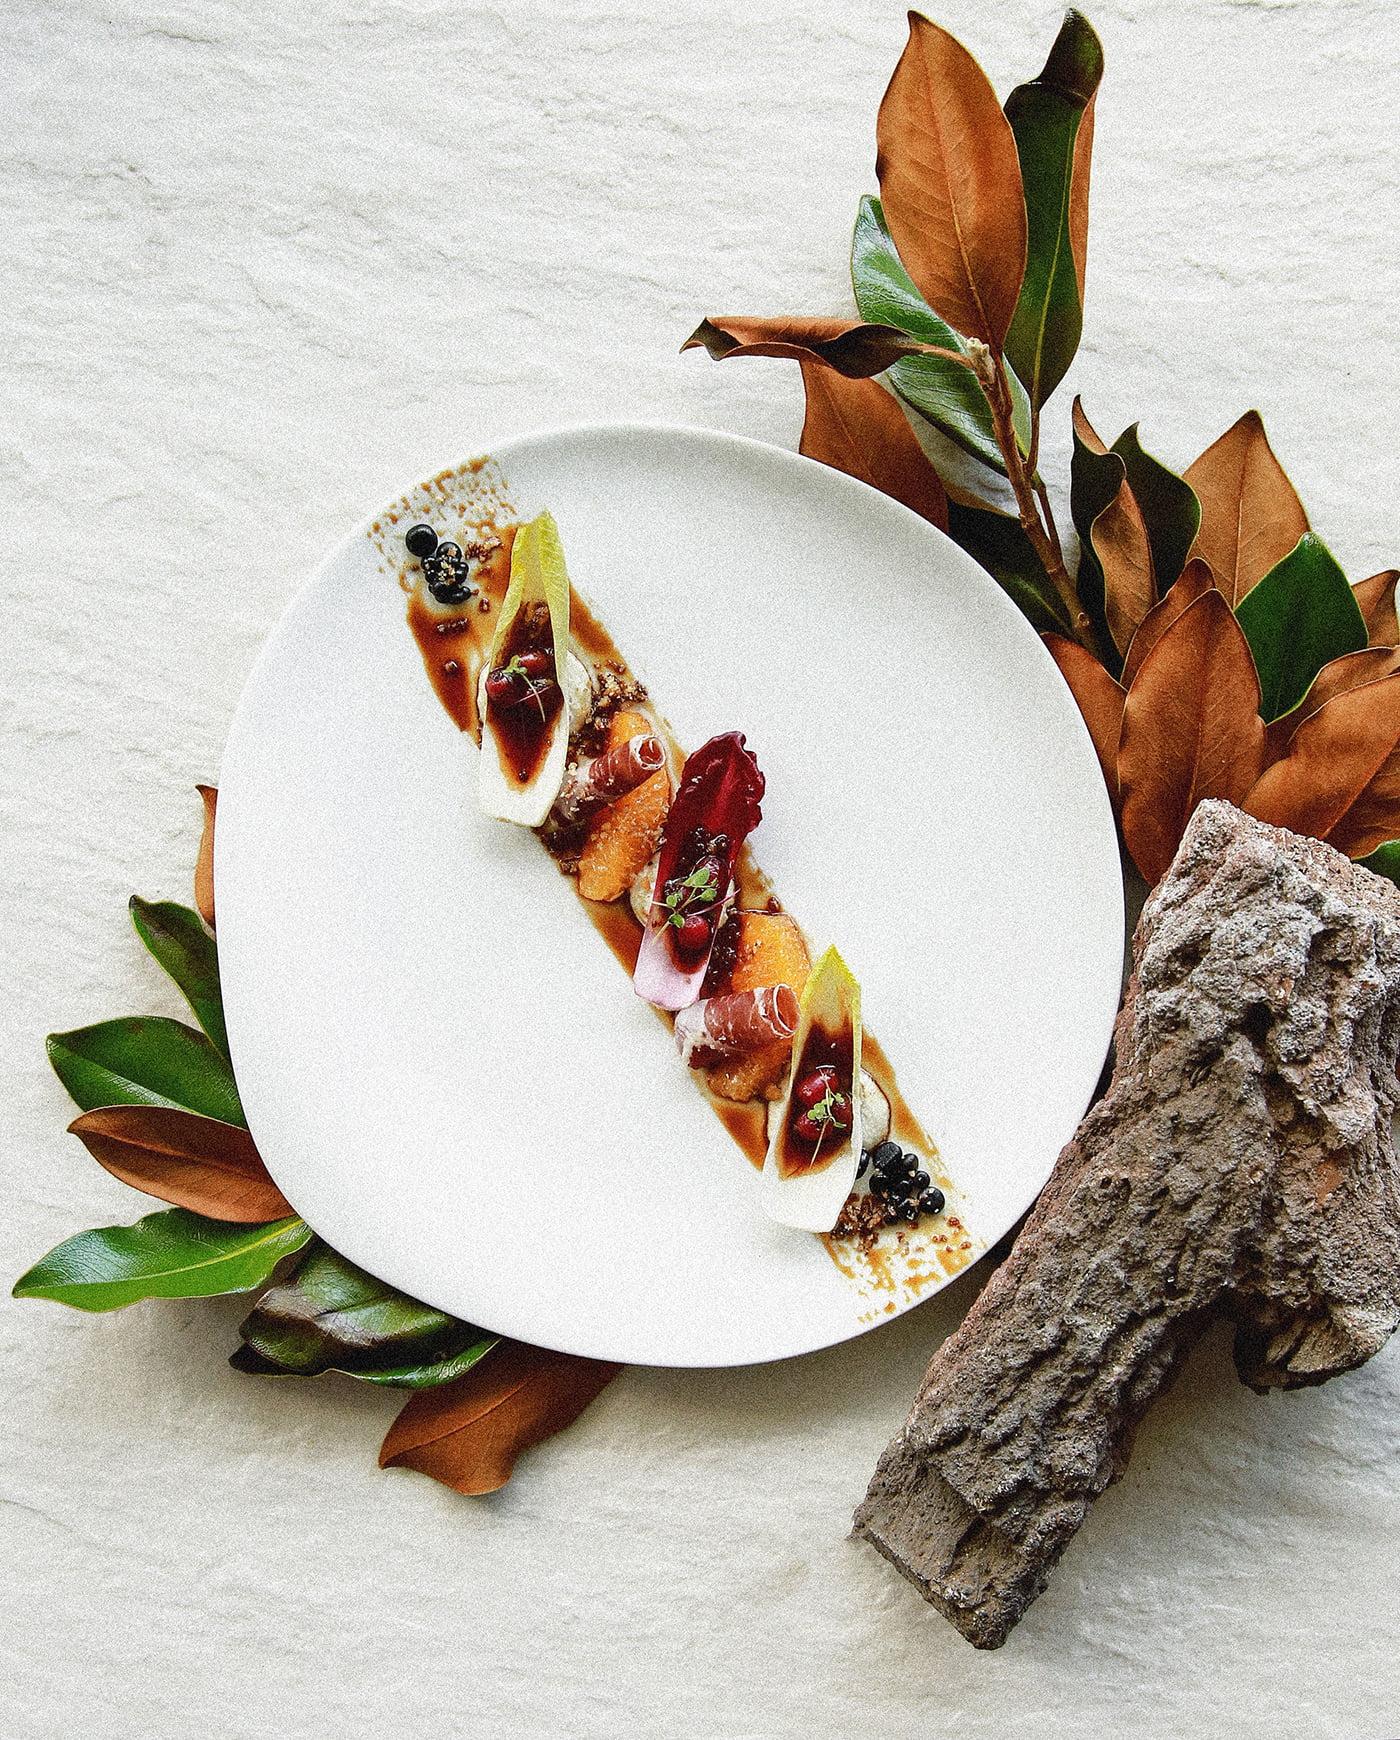 Deer Duck Bistro Menu 2019 by Evelina Photography - Brisbane Food Photographer - Brisbane Venue Photographer Food Photographer Brisbane